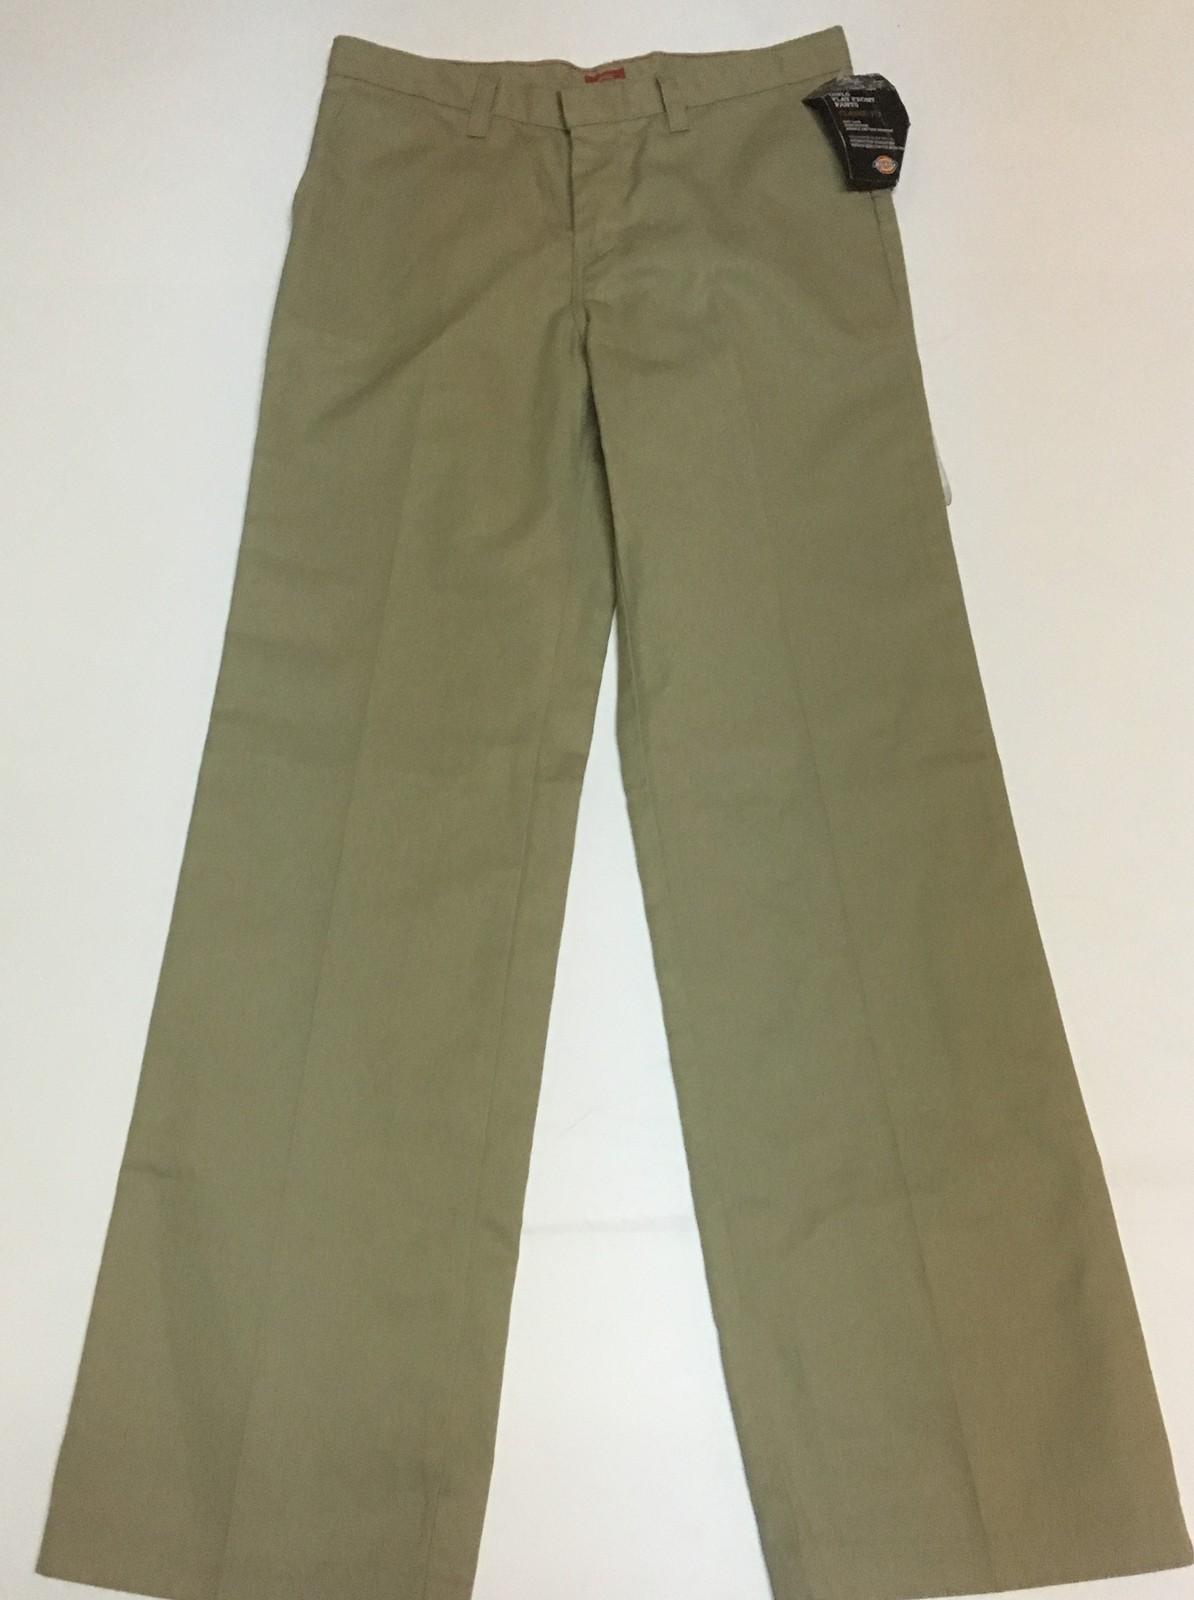 Dickies Khaki Girl's Pants NWT SZ 14 Regular